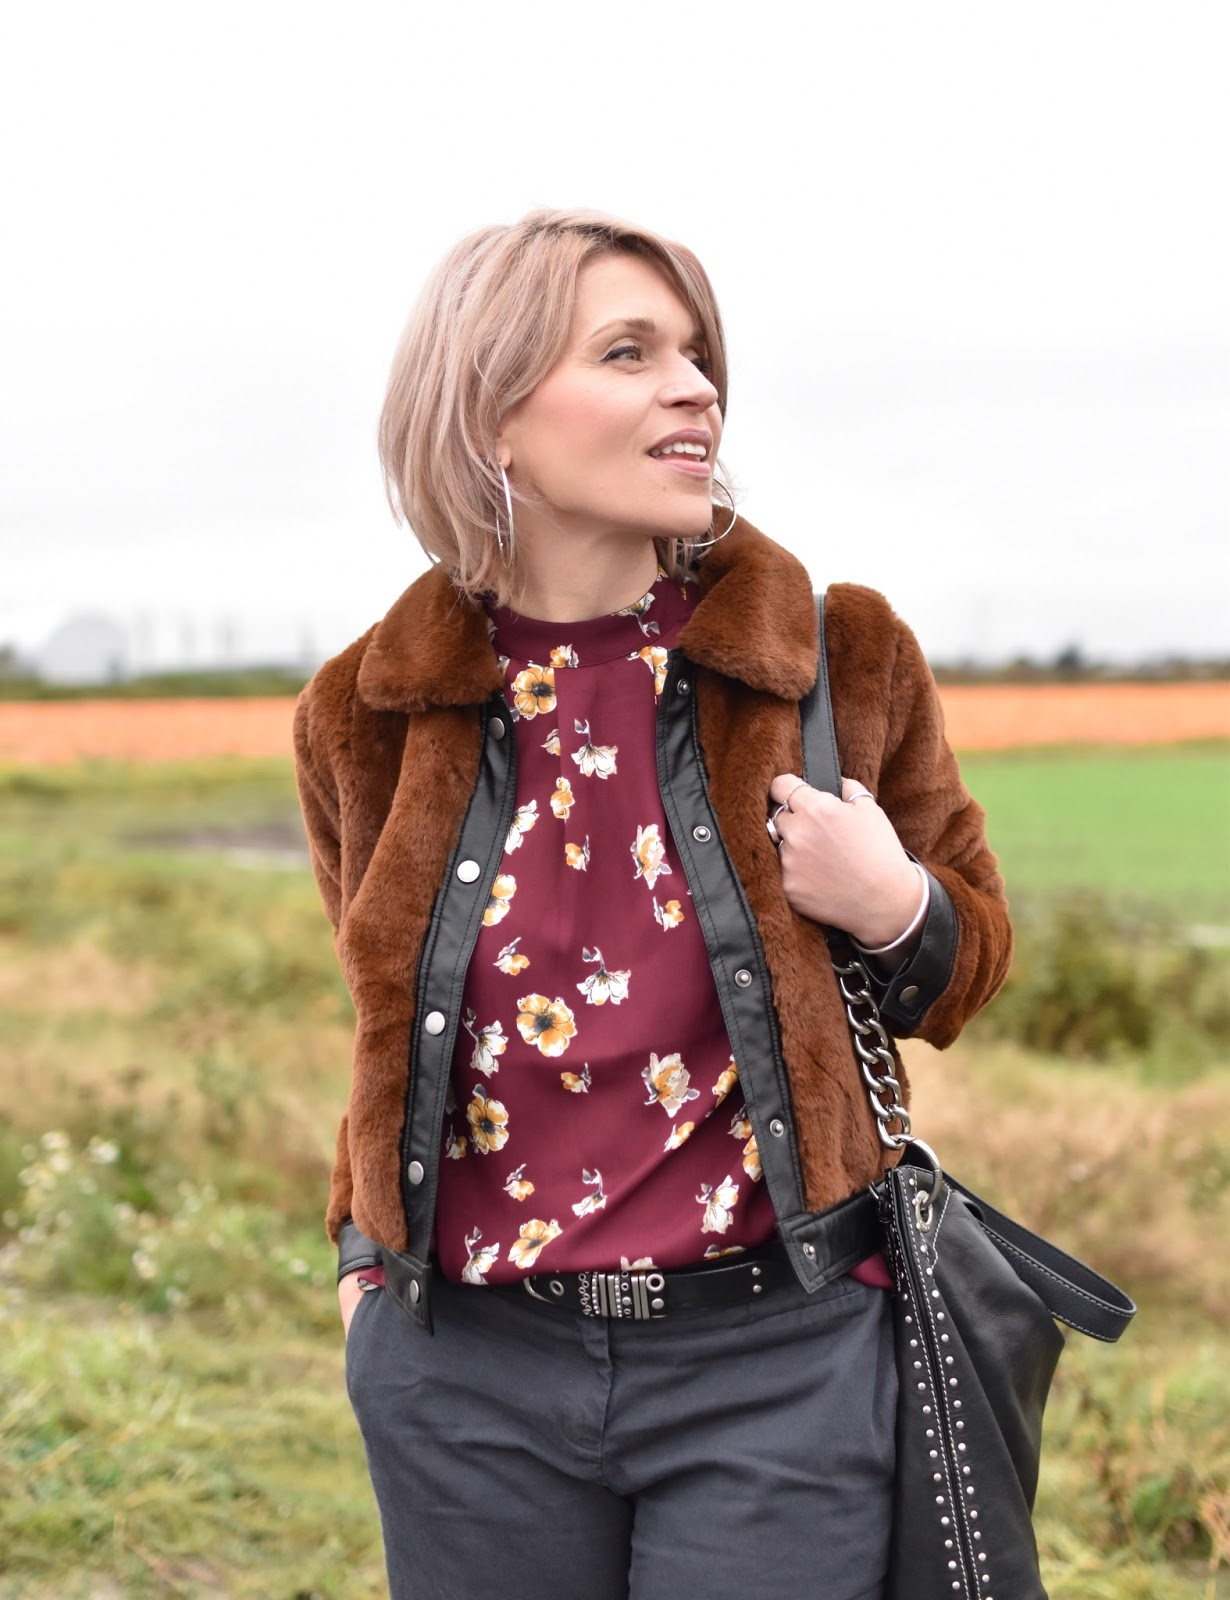 Outfit inspiration c/o Monika Faulkner - faux-fur bomber jacket, floral blouse, MK bag